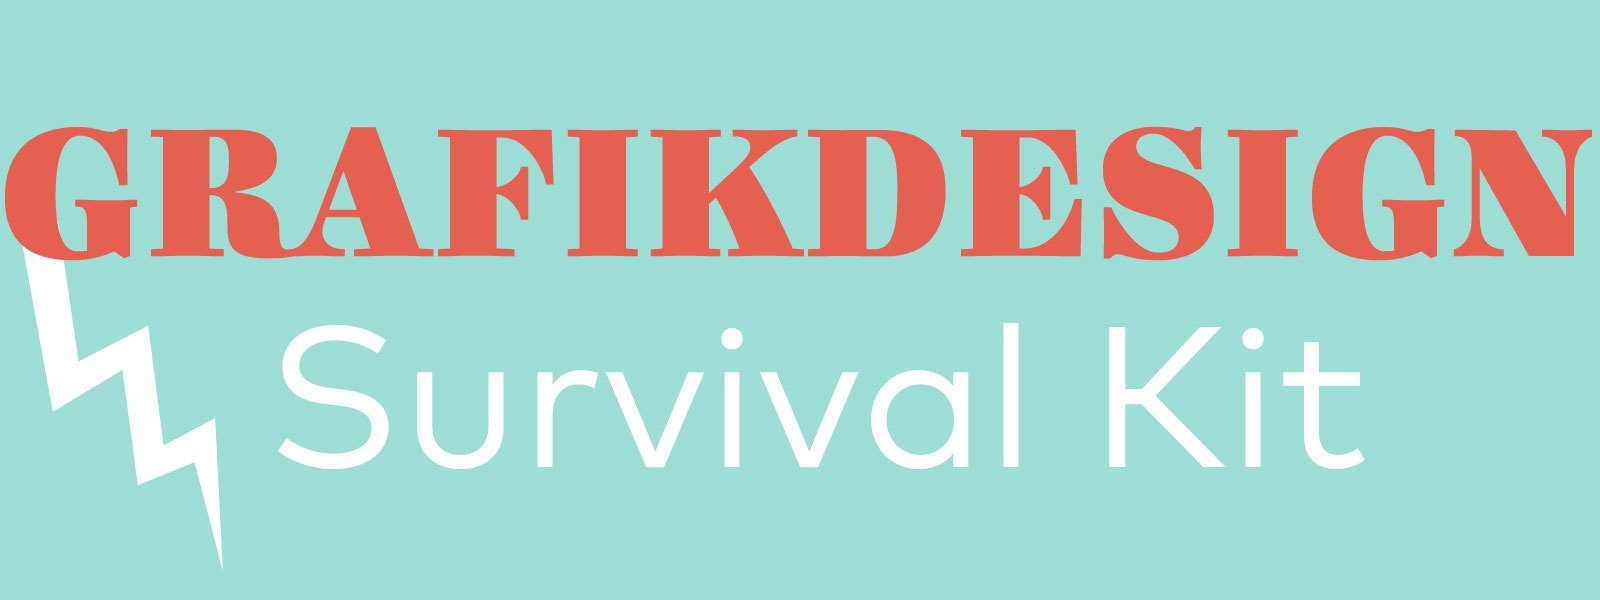 Branche_Grafikdesign_Survival_Kit_072015_Teaser